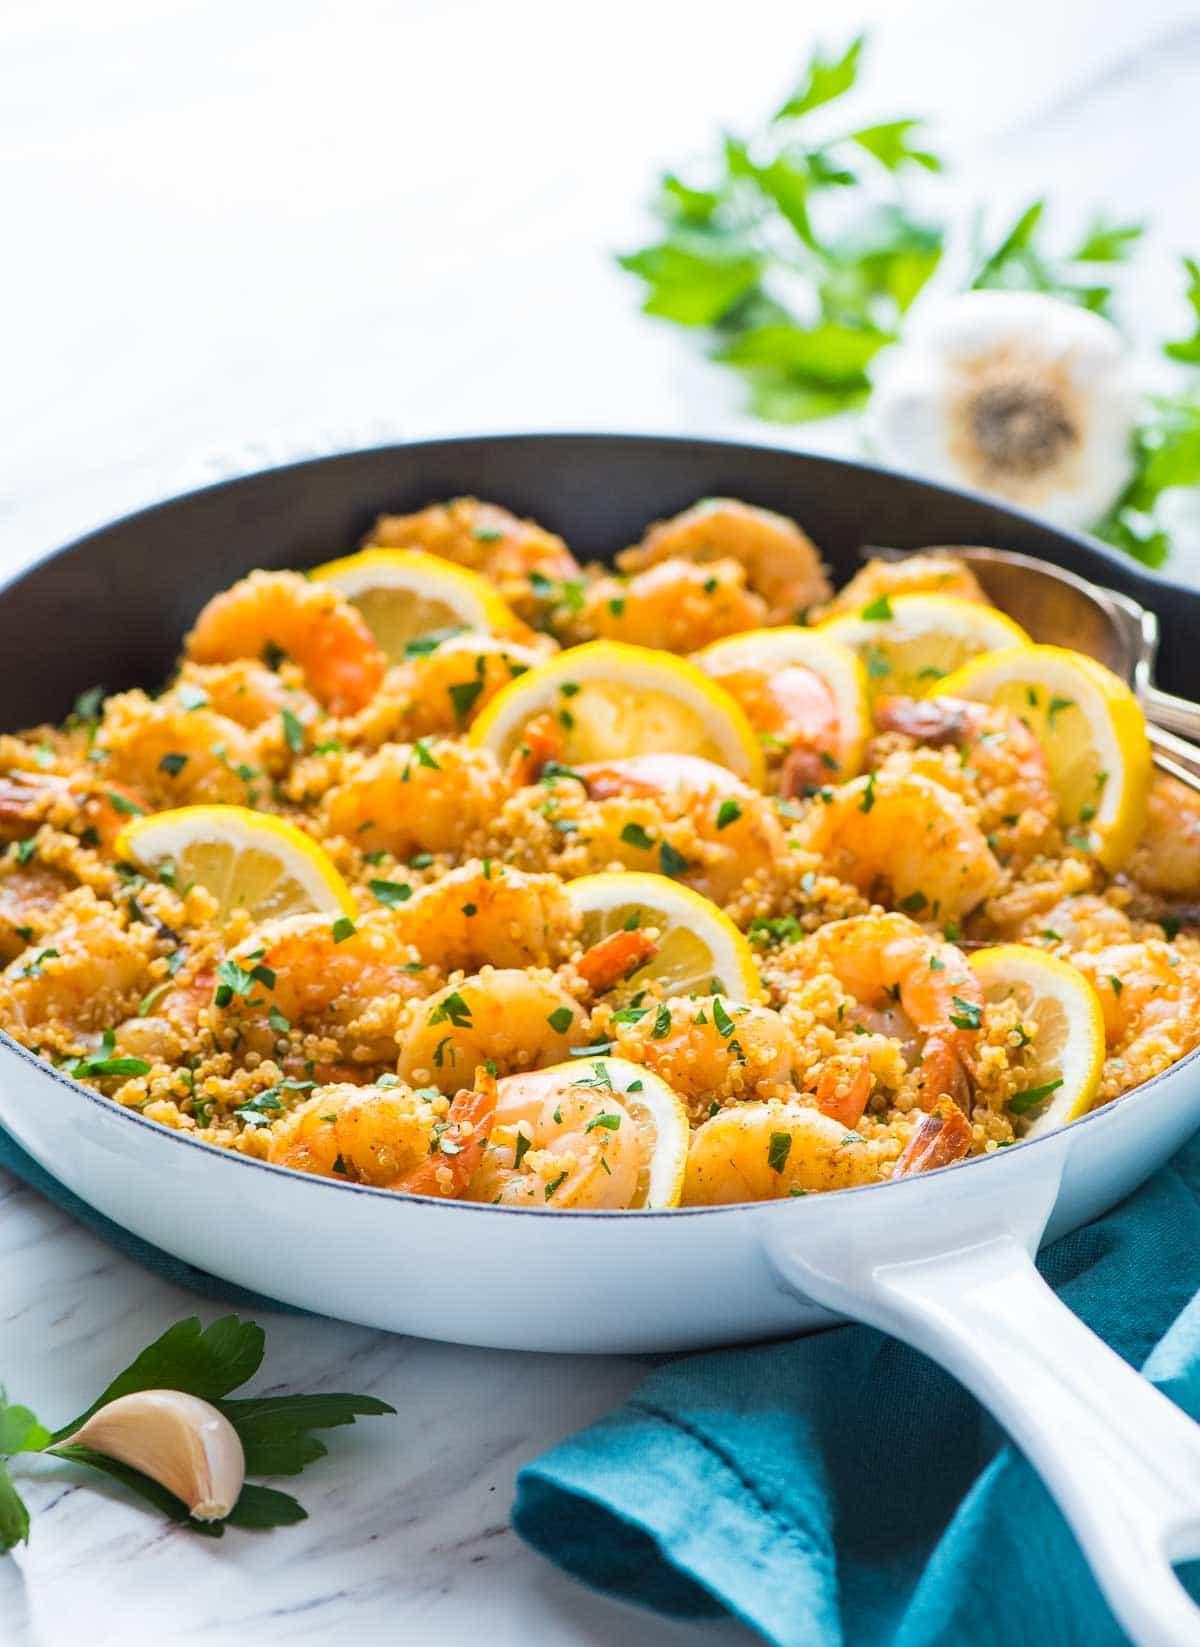 Healthy Shrimp And Quinoa Recipes  Garlic Shrimp with Quinoa